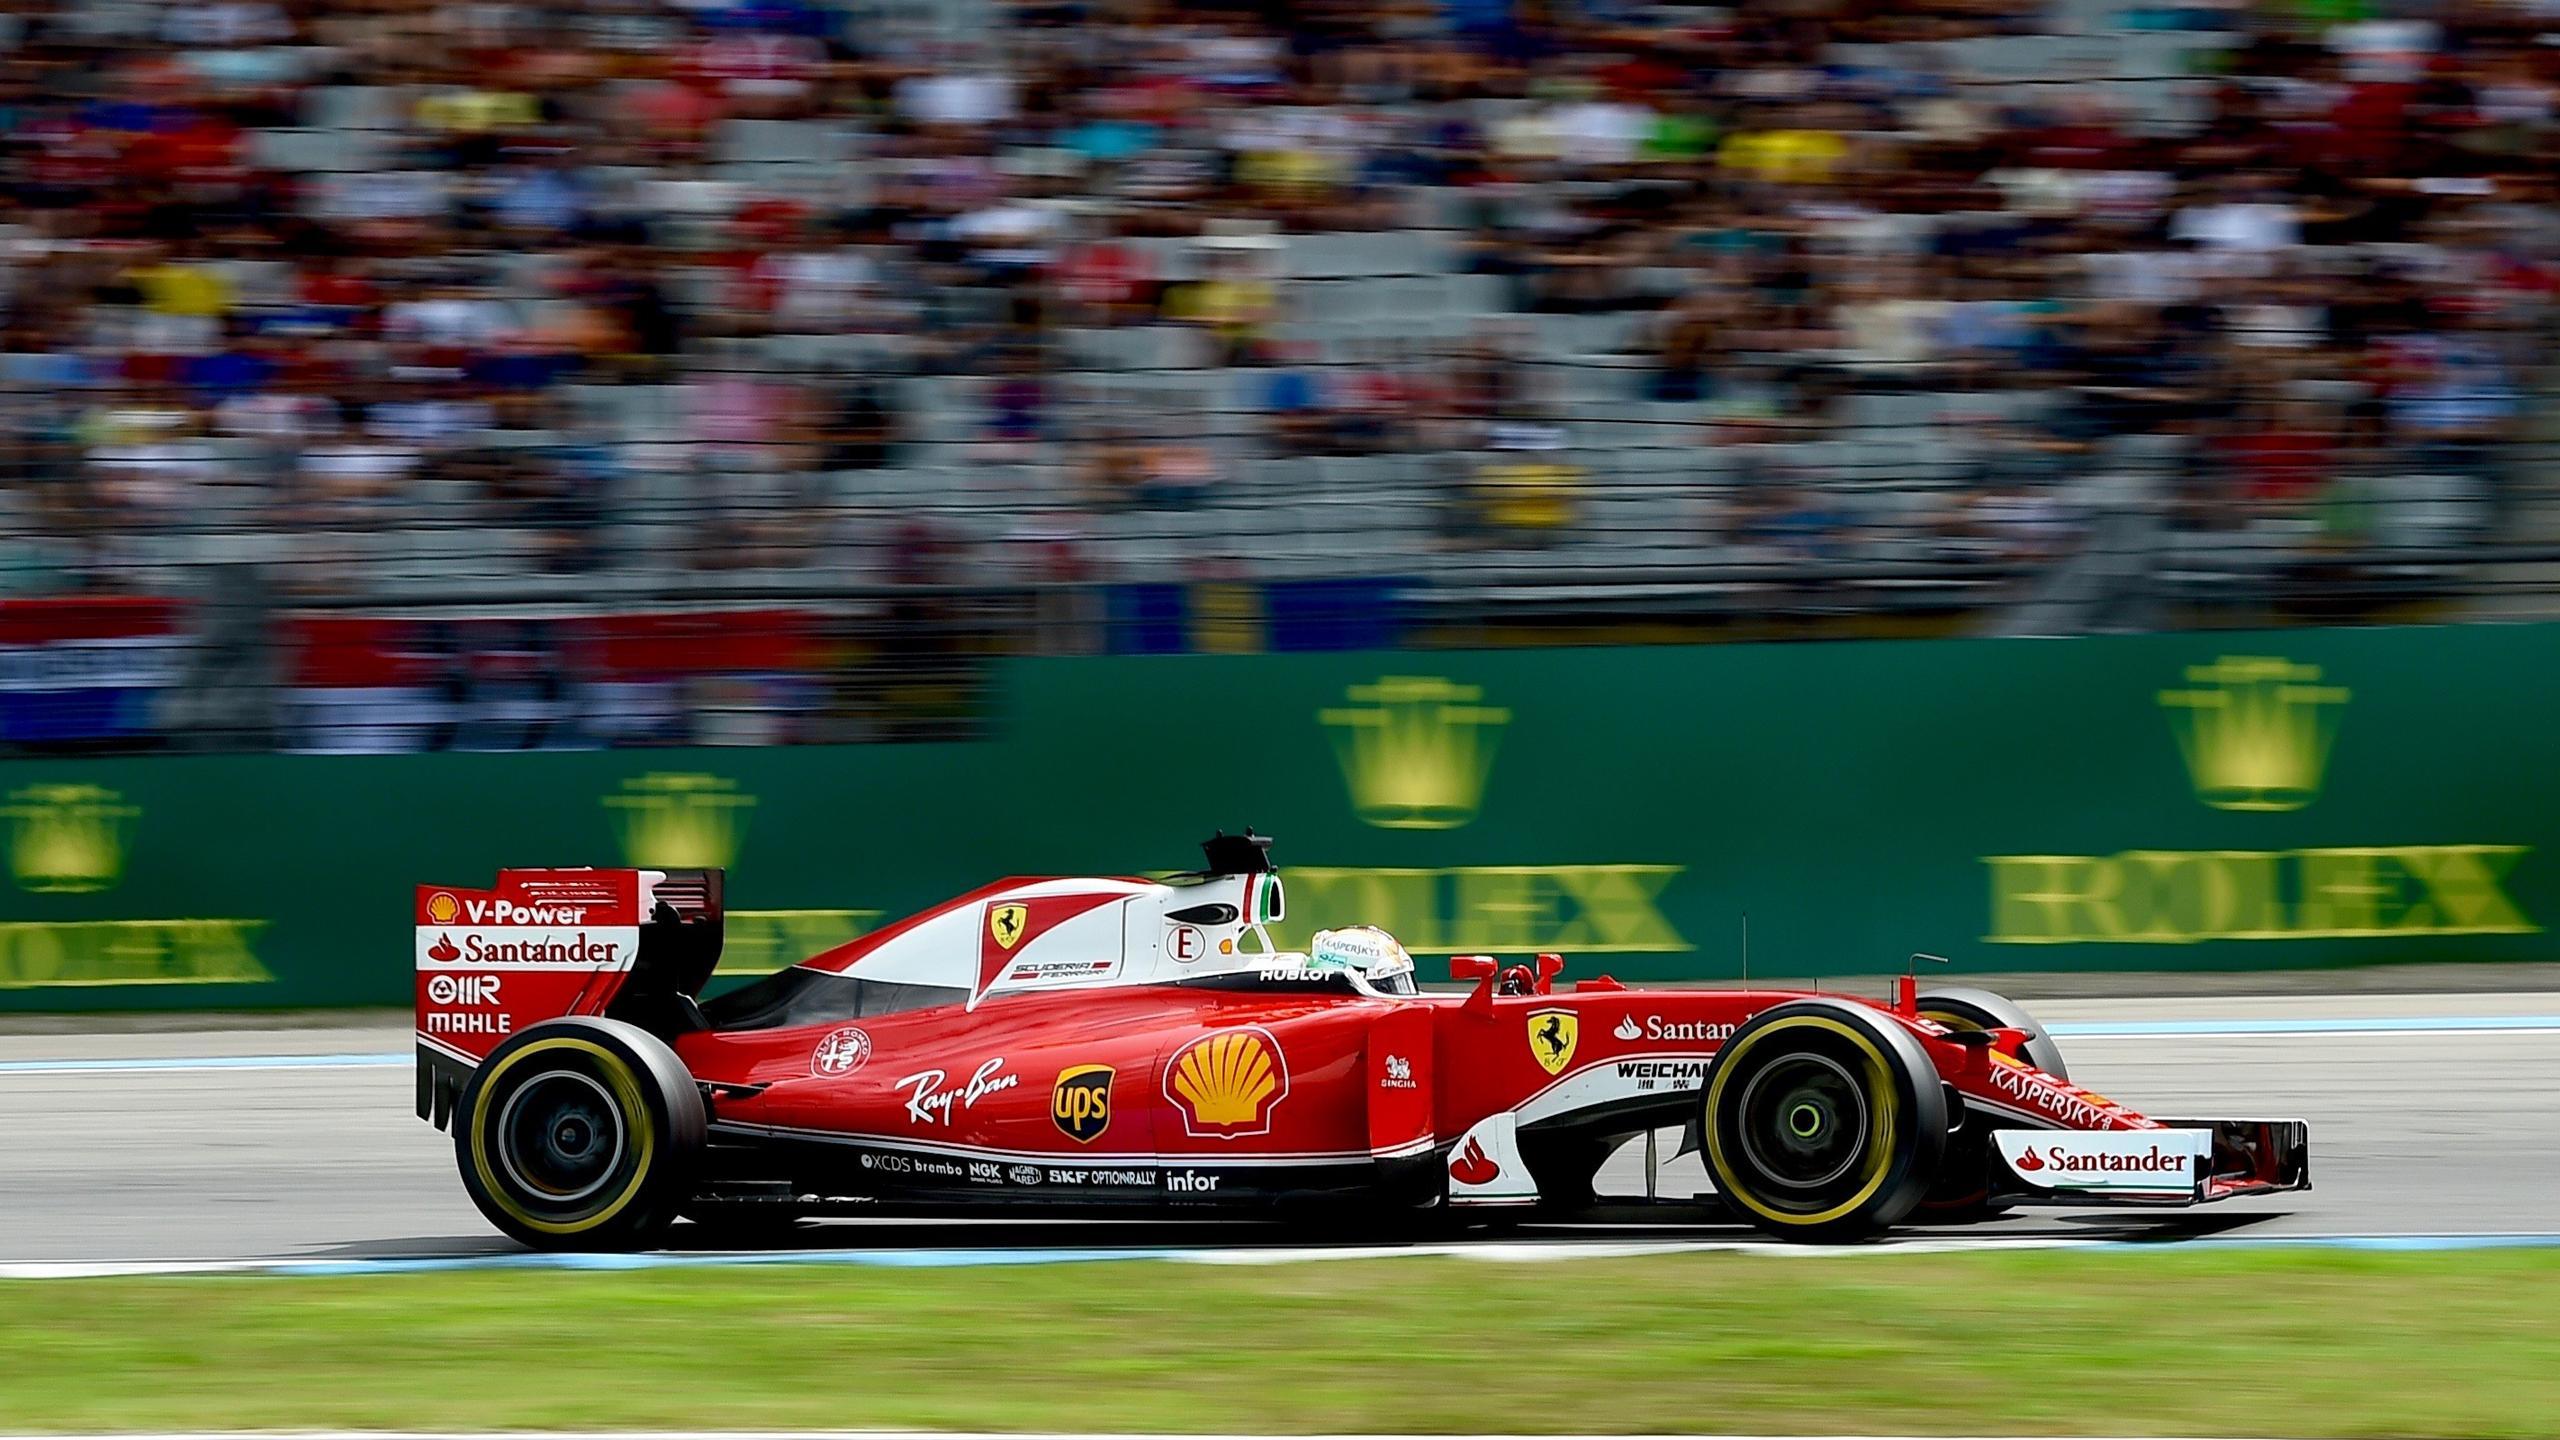 Sebastian Vettel (Ferrari) au Grand Prix d'Allemagne 2016